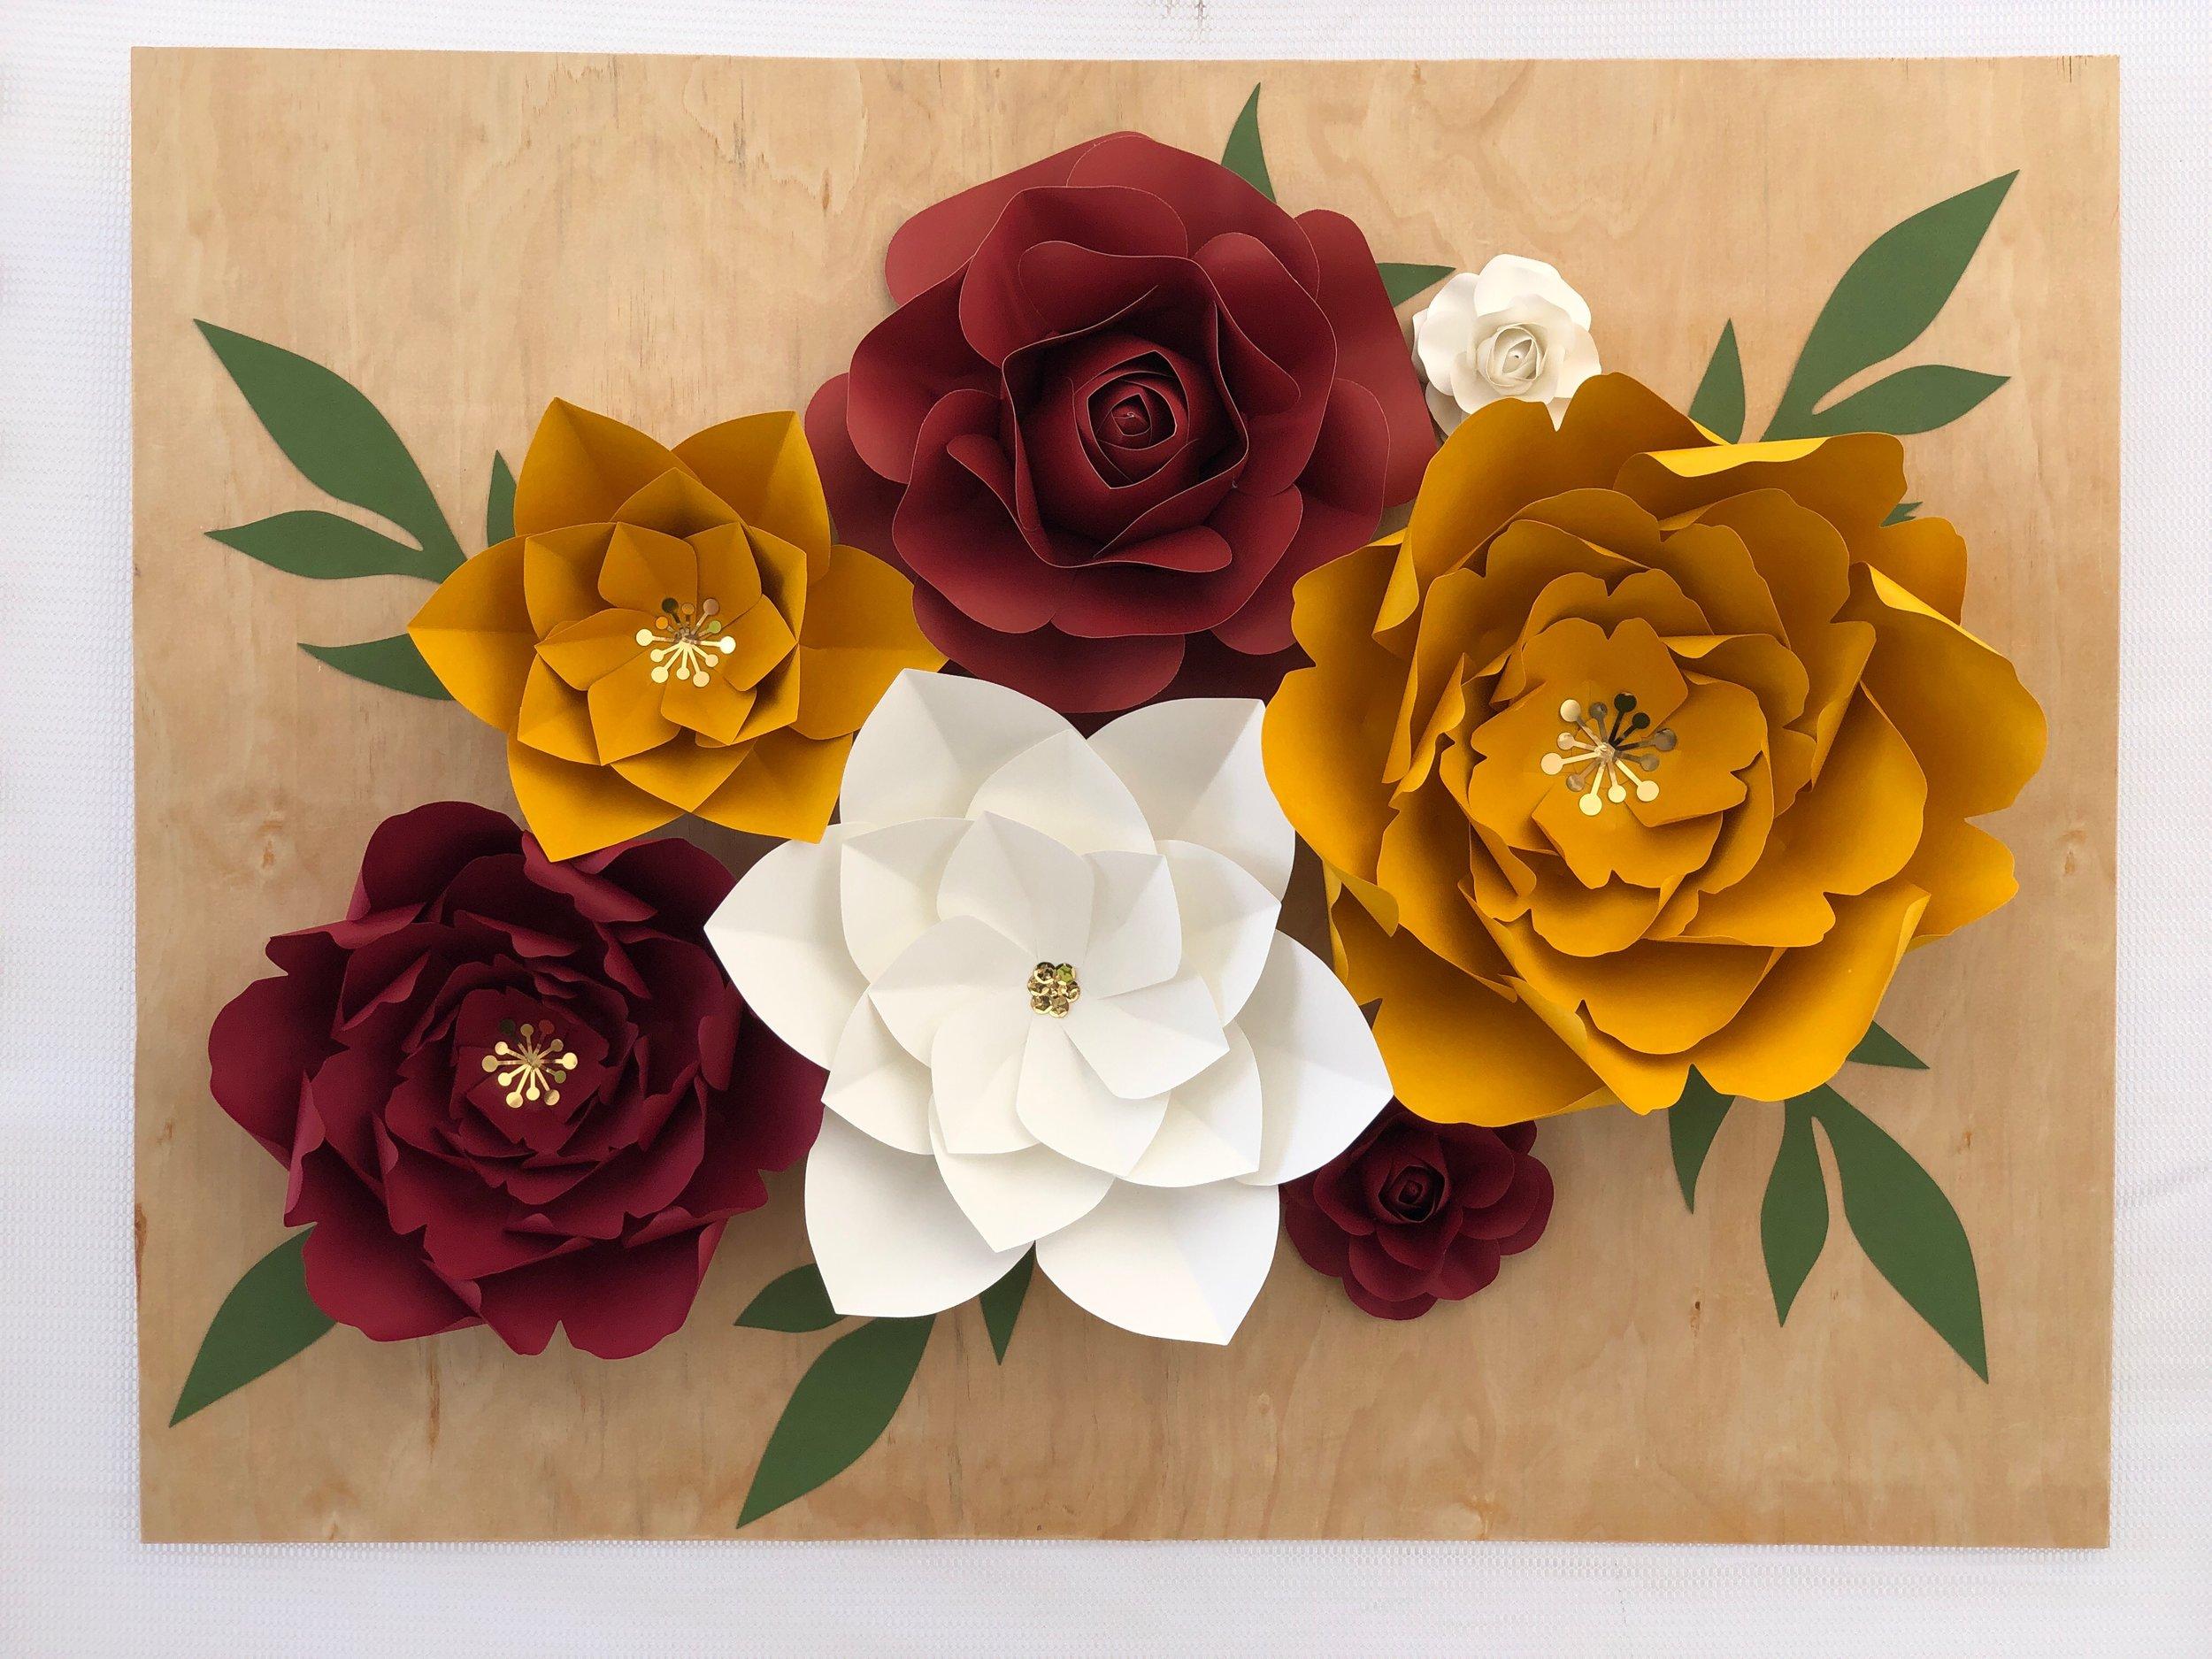 Roses and Peonies wall display by:  emilyanne_flowers